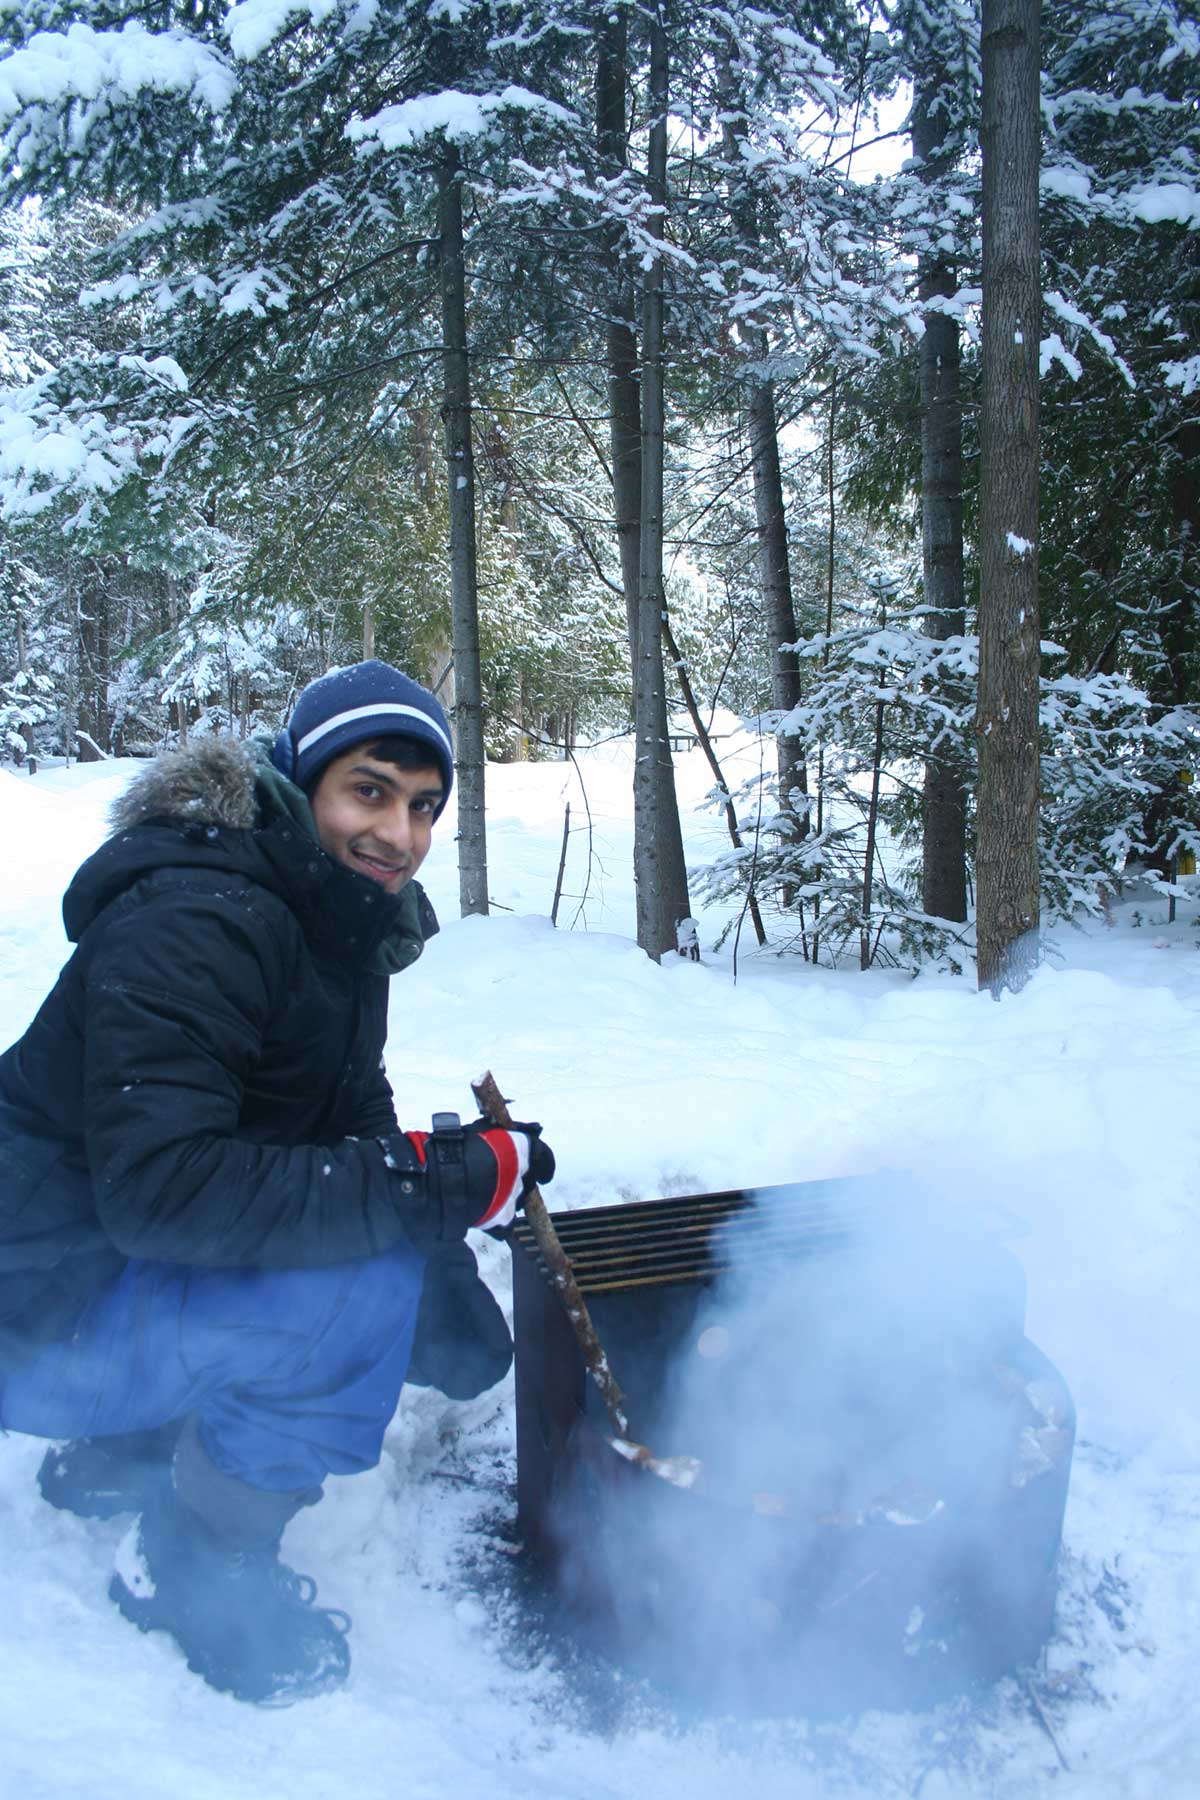 Winter-Camping-Humber-2015-049.jpg